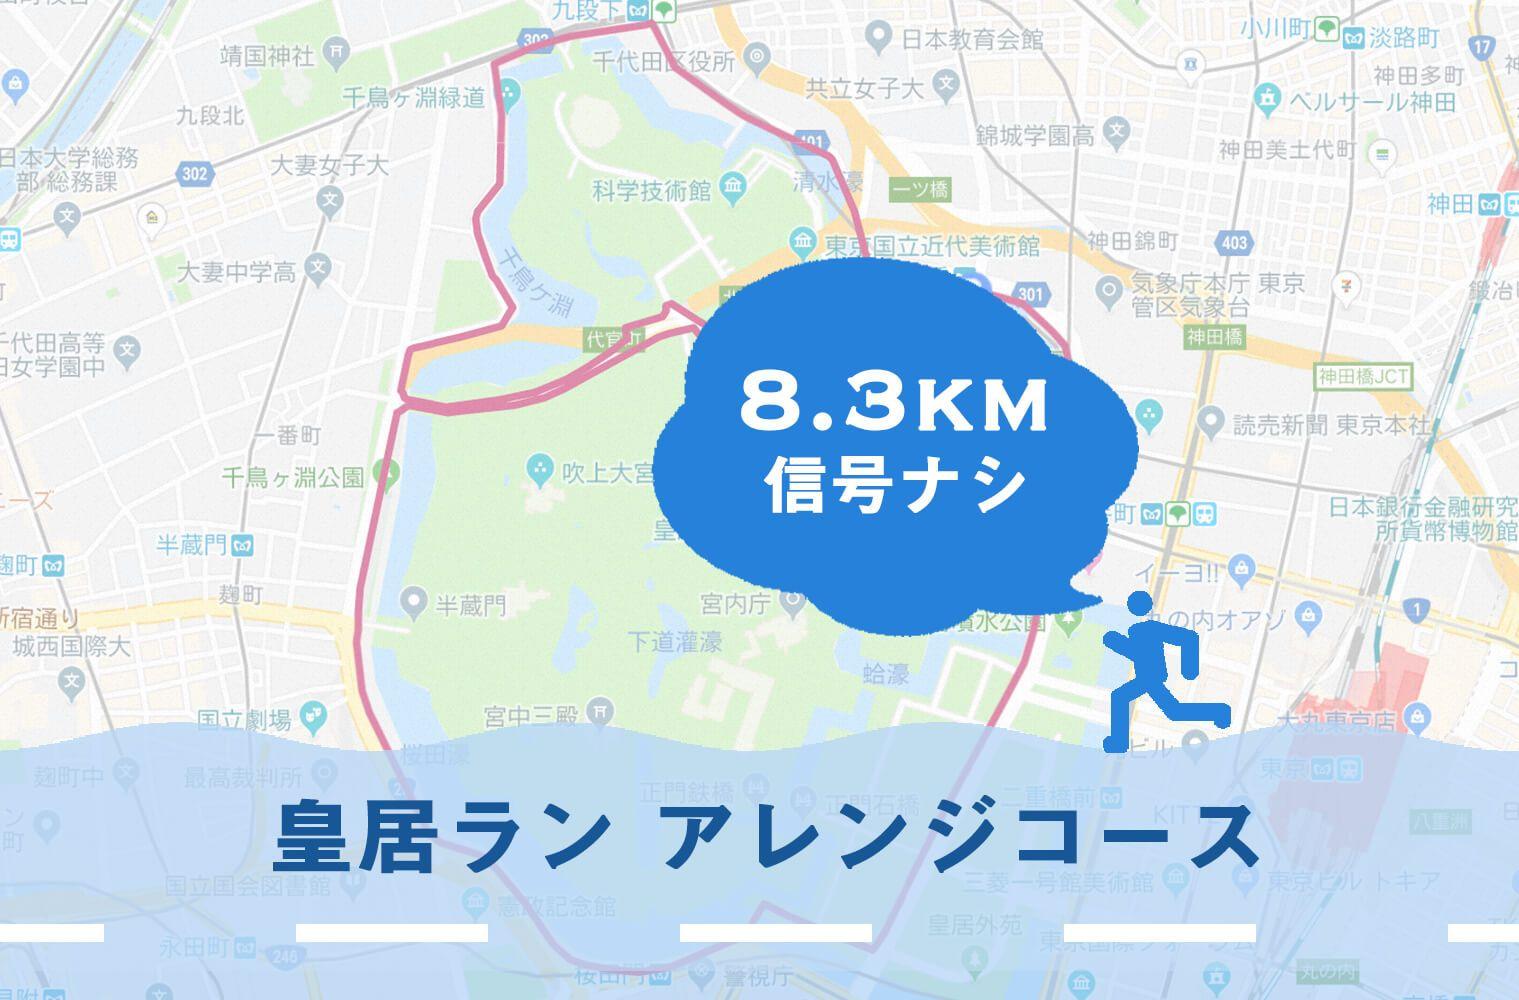 【8.3km】皇居ラン アレンジランニングコース(信号ナシ)の写真付きガイド